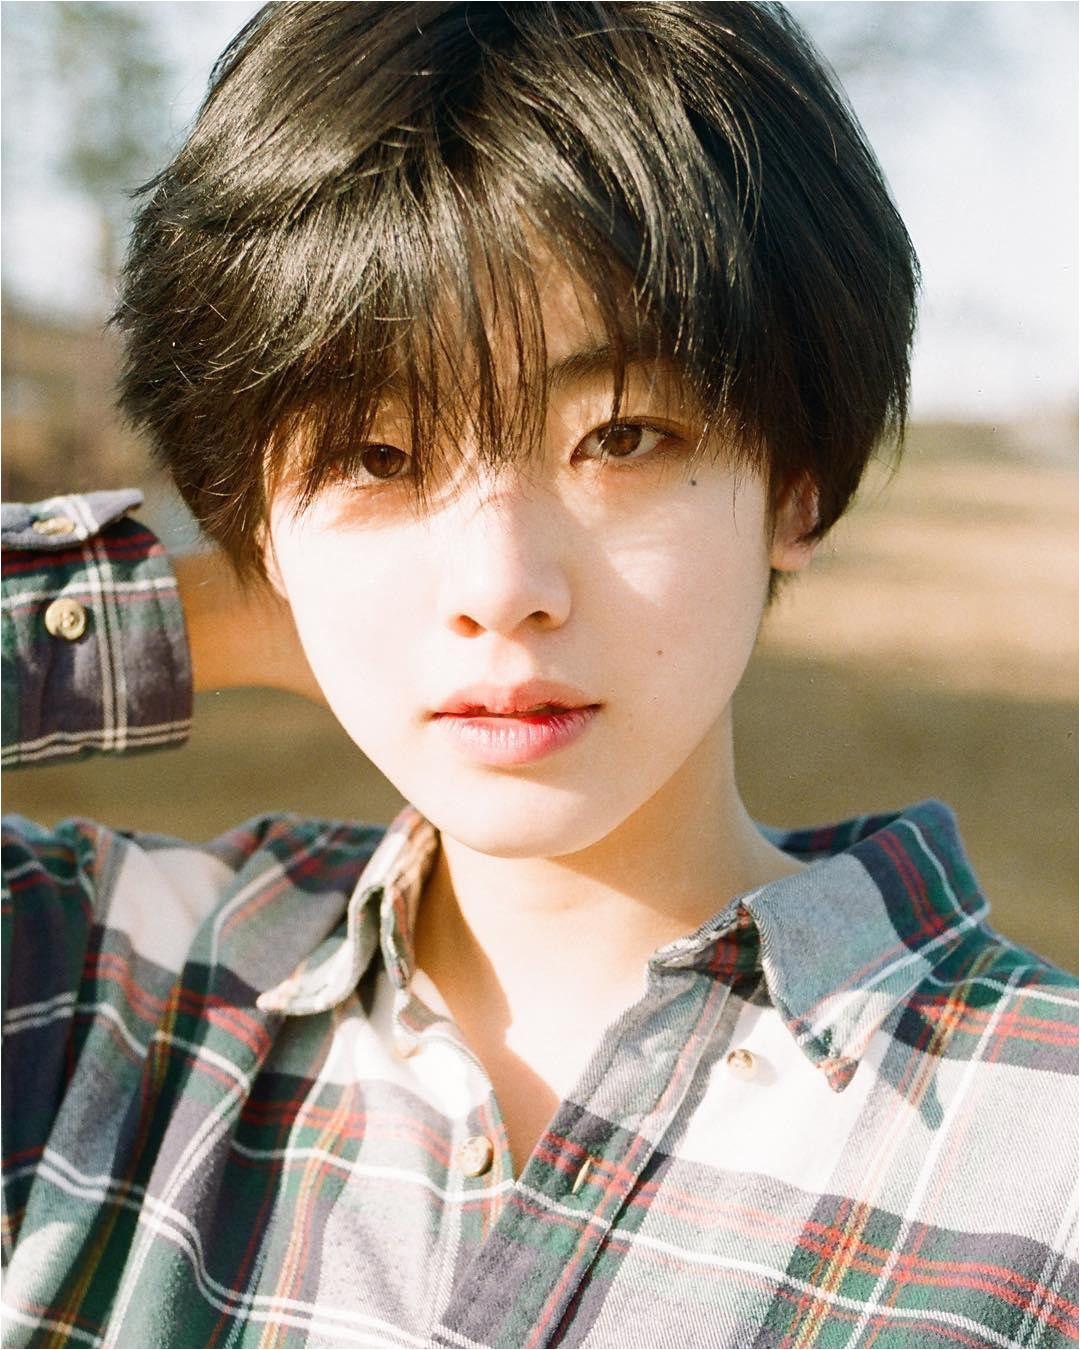 Korean Short Hair for Men Hairstyle for asian Hair Male Beautiful tomboy Haircut 0d tomboy